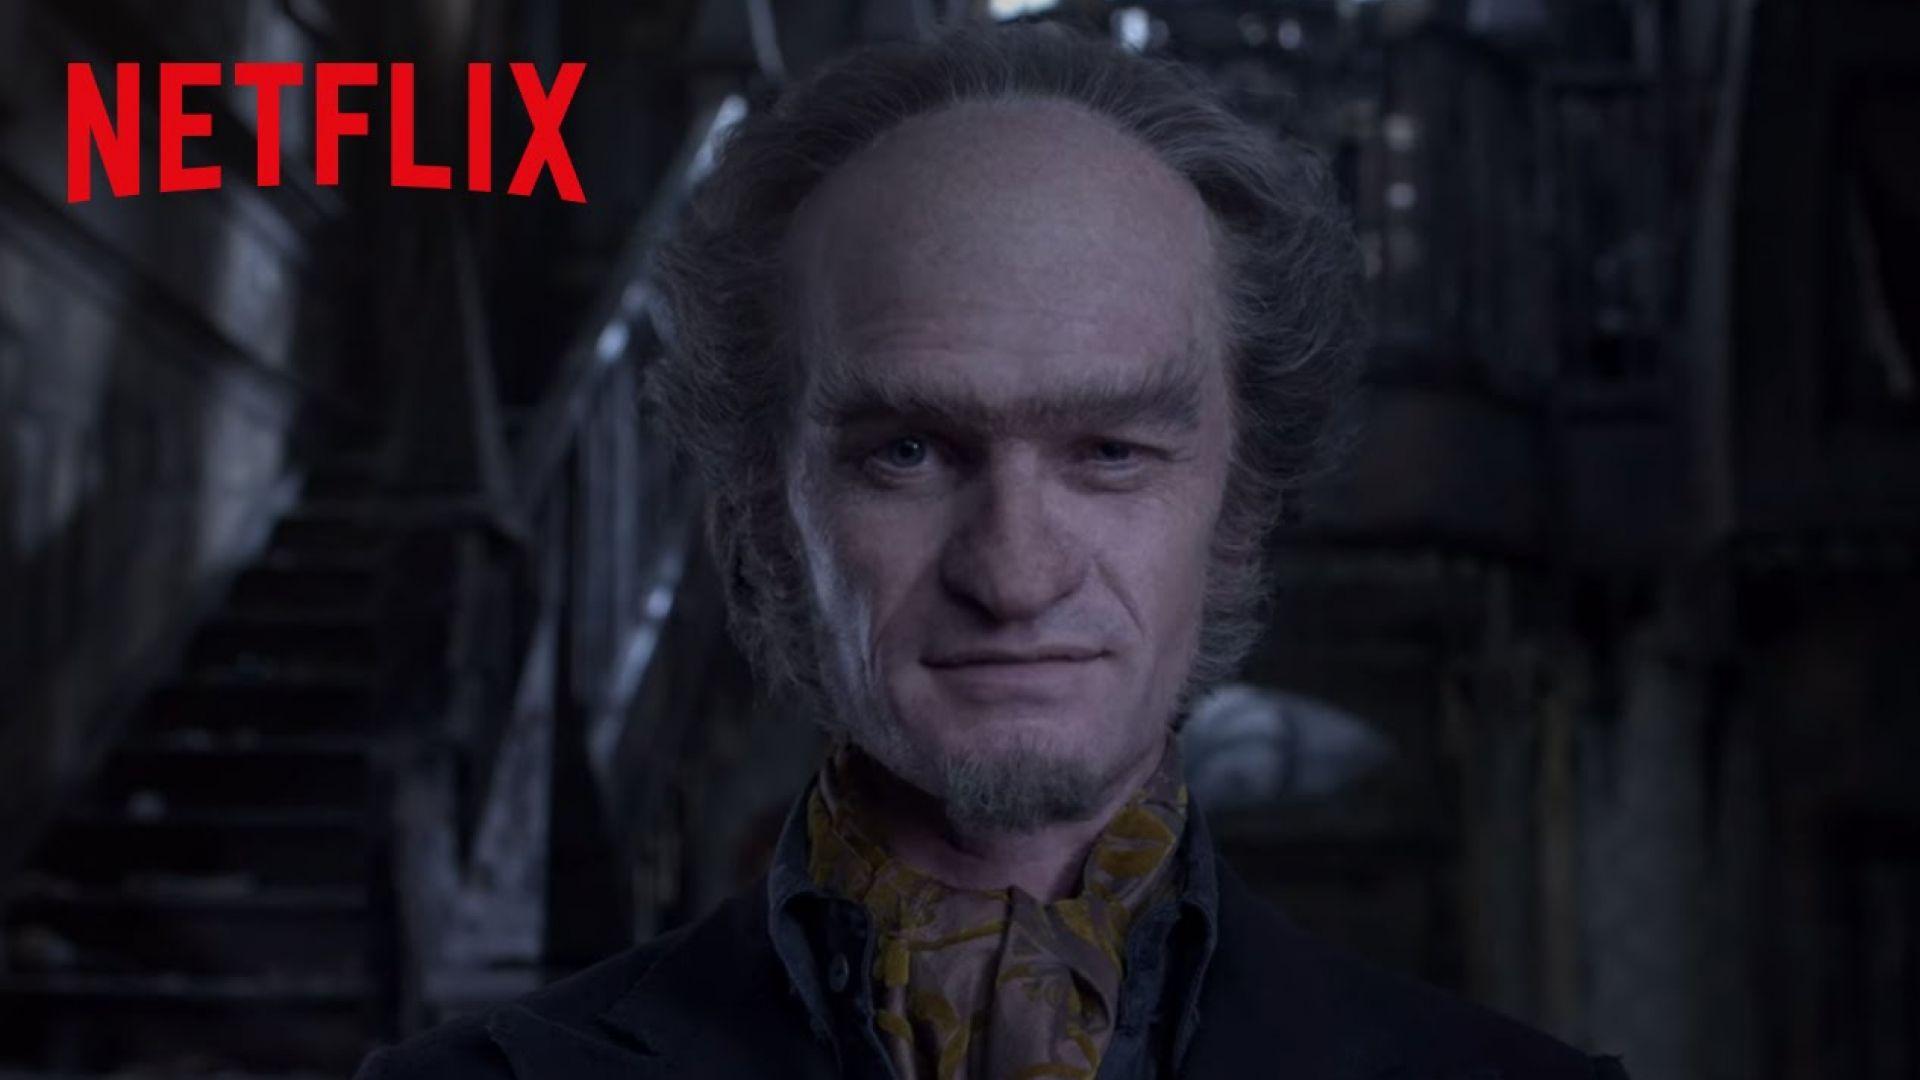 First official trailer for Netflix's 'A Series of Unfortunat